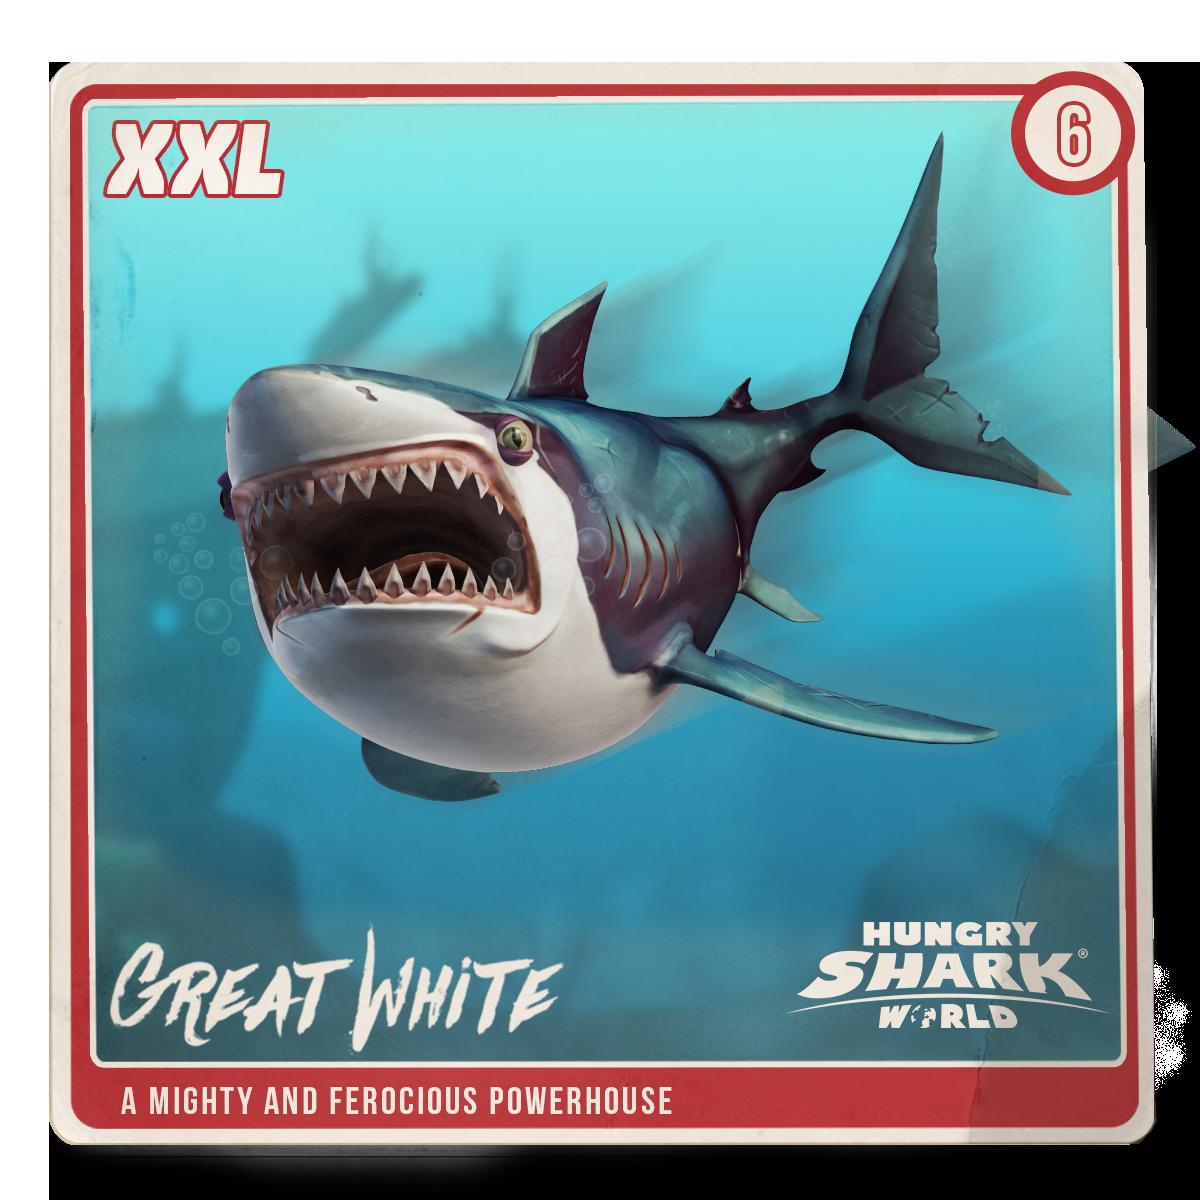 18 Hungry Shark ideas in 18   shark, hungry, shark games